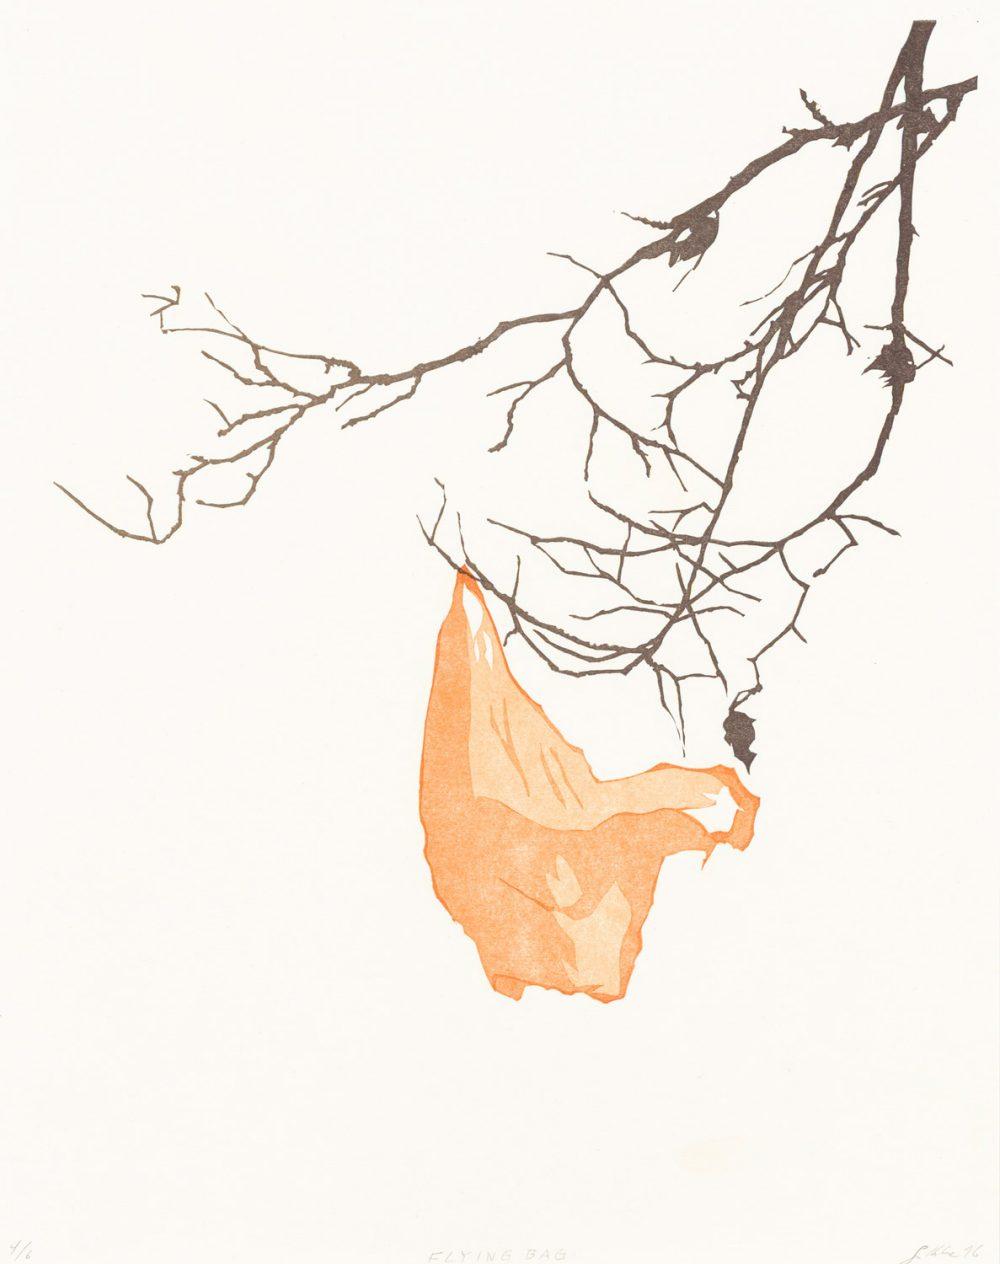 Flying Bag (2016), 32 x 25 cm, Linolschnitt auf Papier, Ed. 6